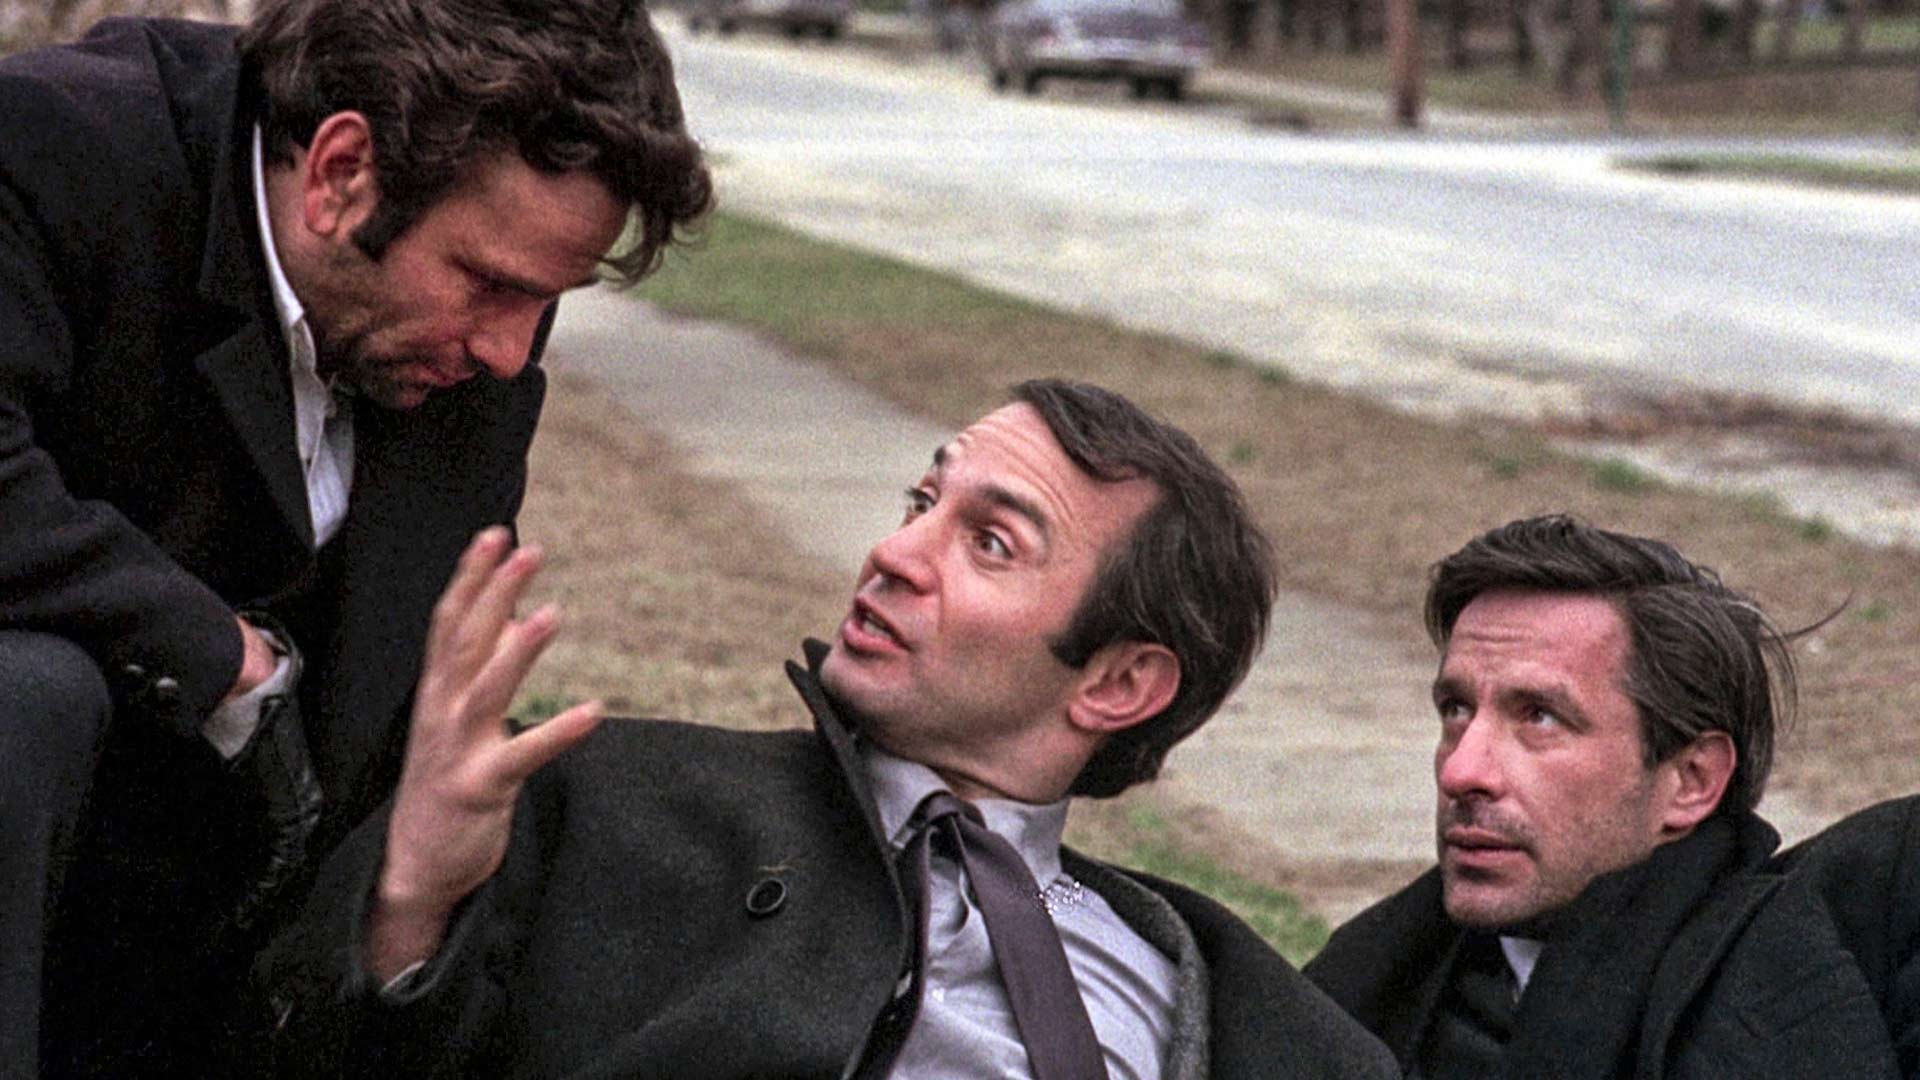 Archie (Peter Falk), Harry (Ben Gazzara) ja Gus (John Cassavetes) elokuvassa Aviomiehet.